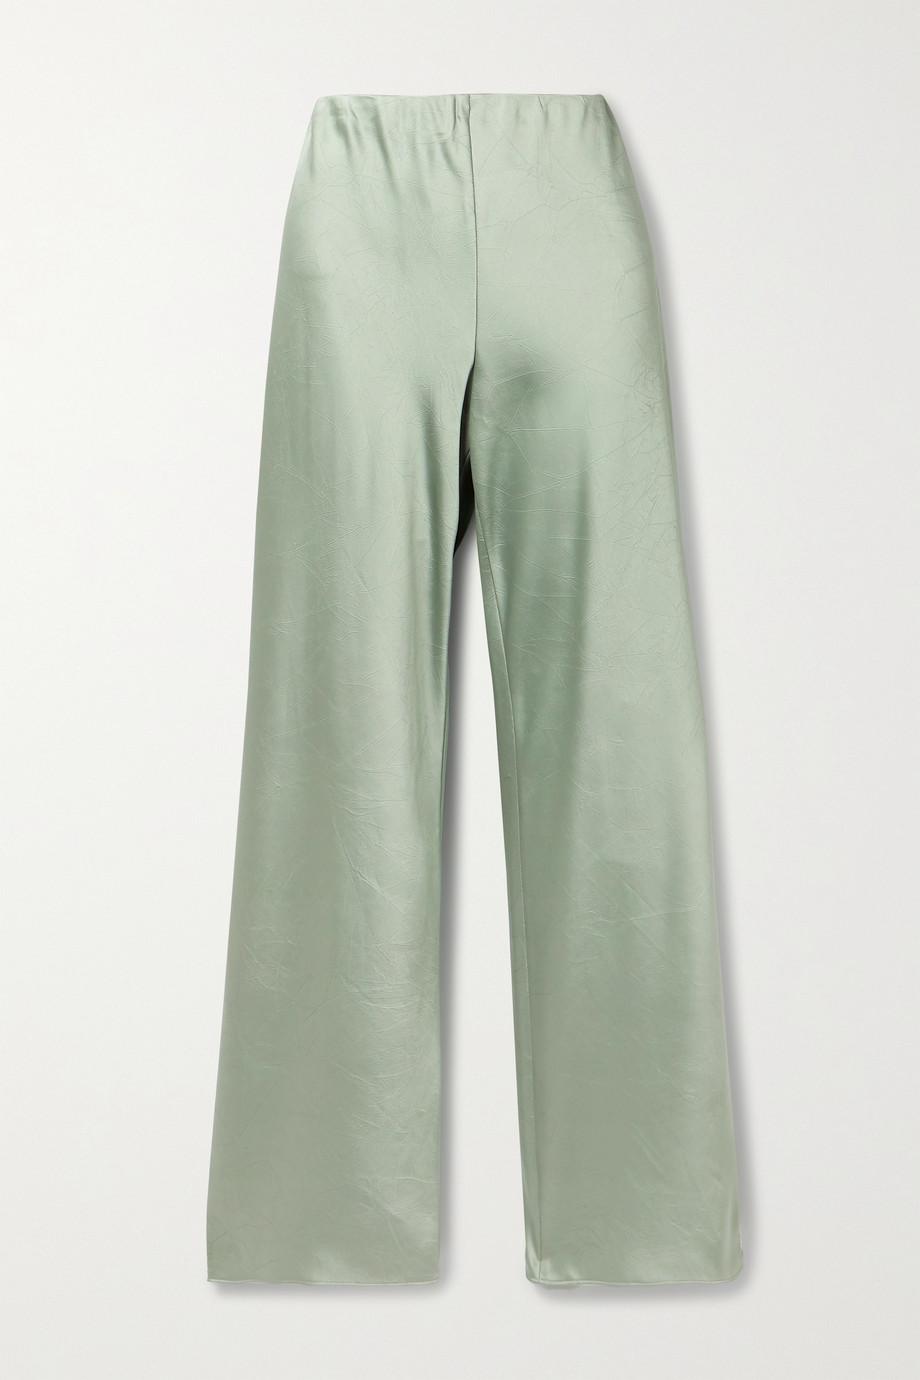 Vince 褶皱缎布直筒裤